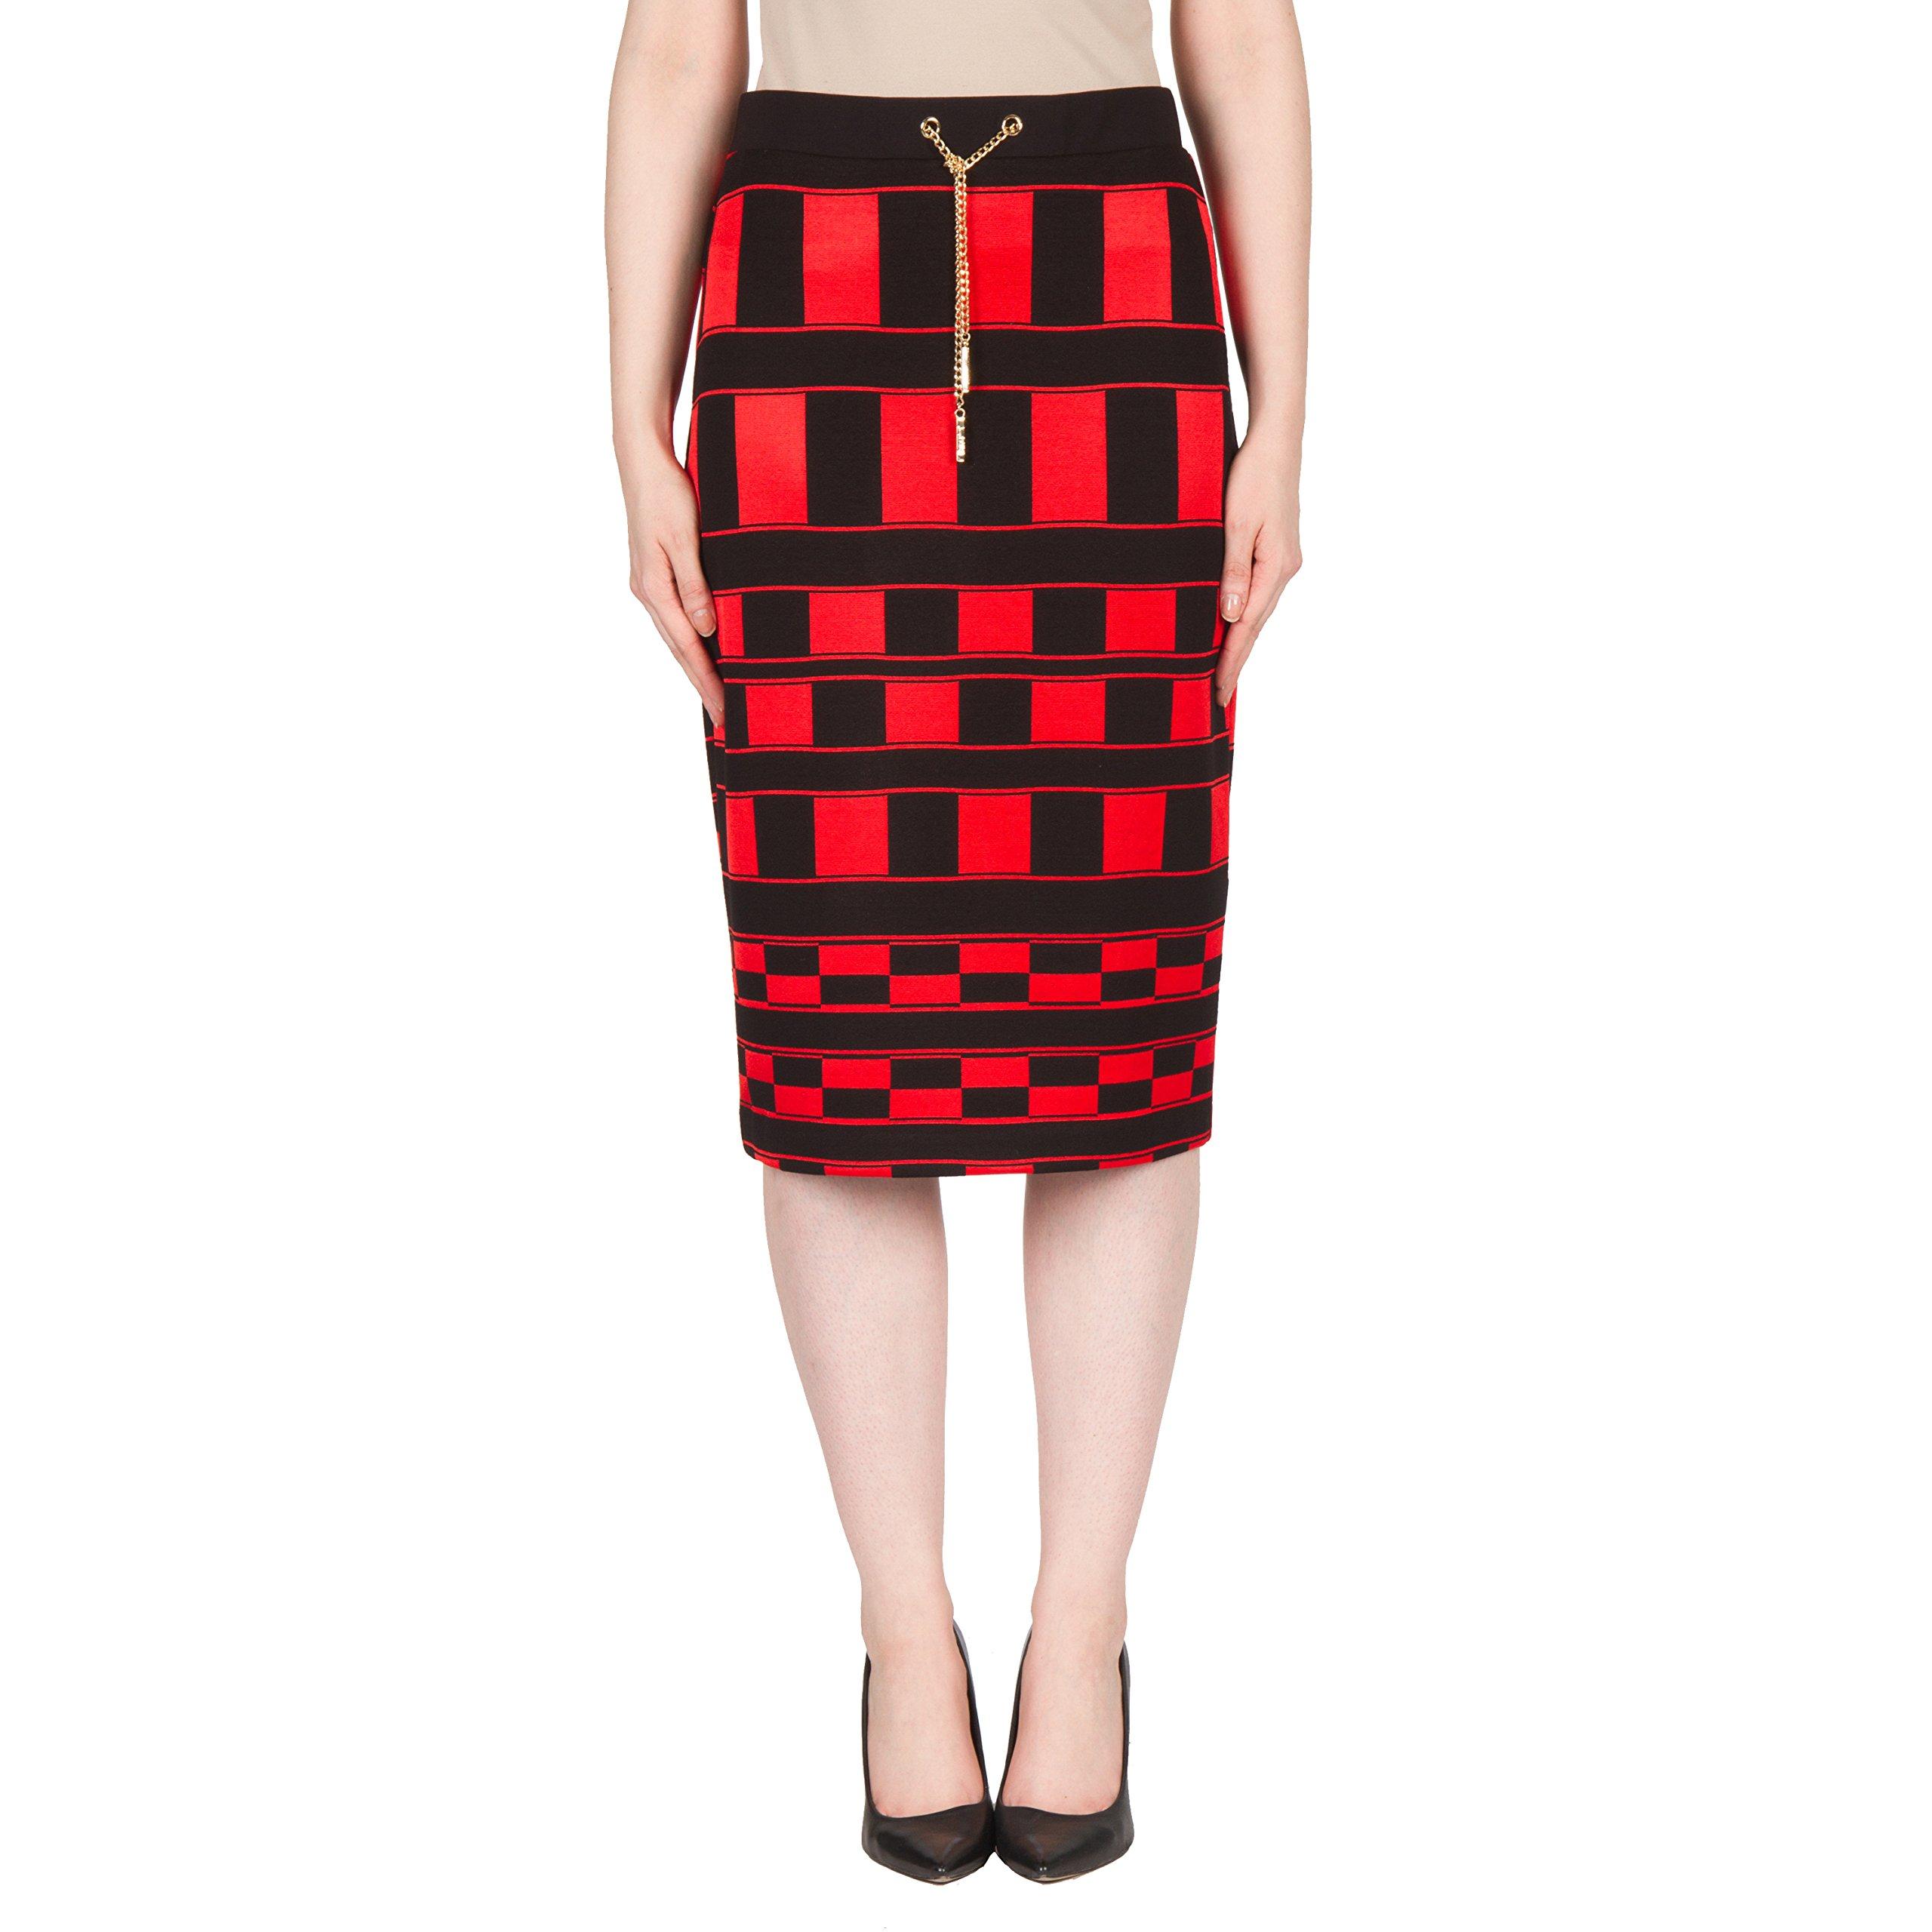 Joseph Ribkoff Jacquard Silky Knit Pencil Skirt Style 173782 - Size 8